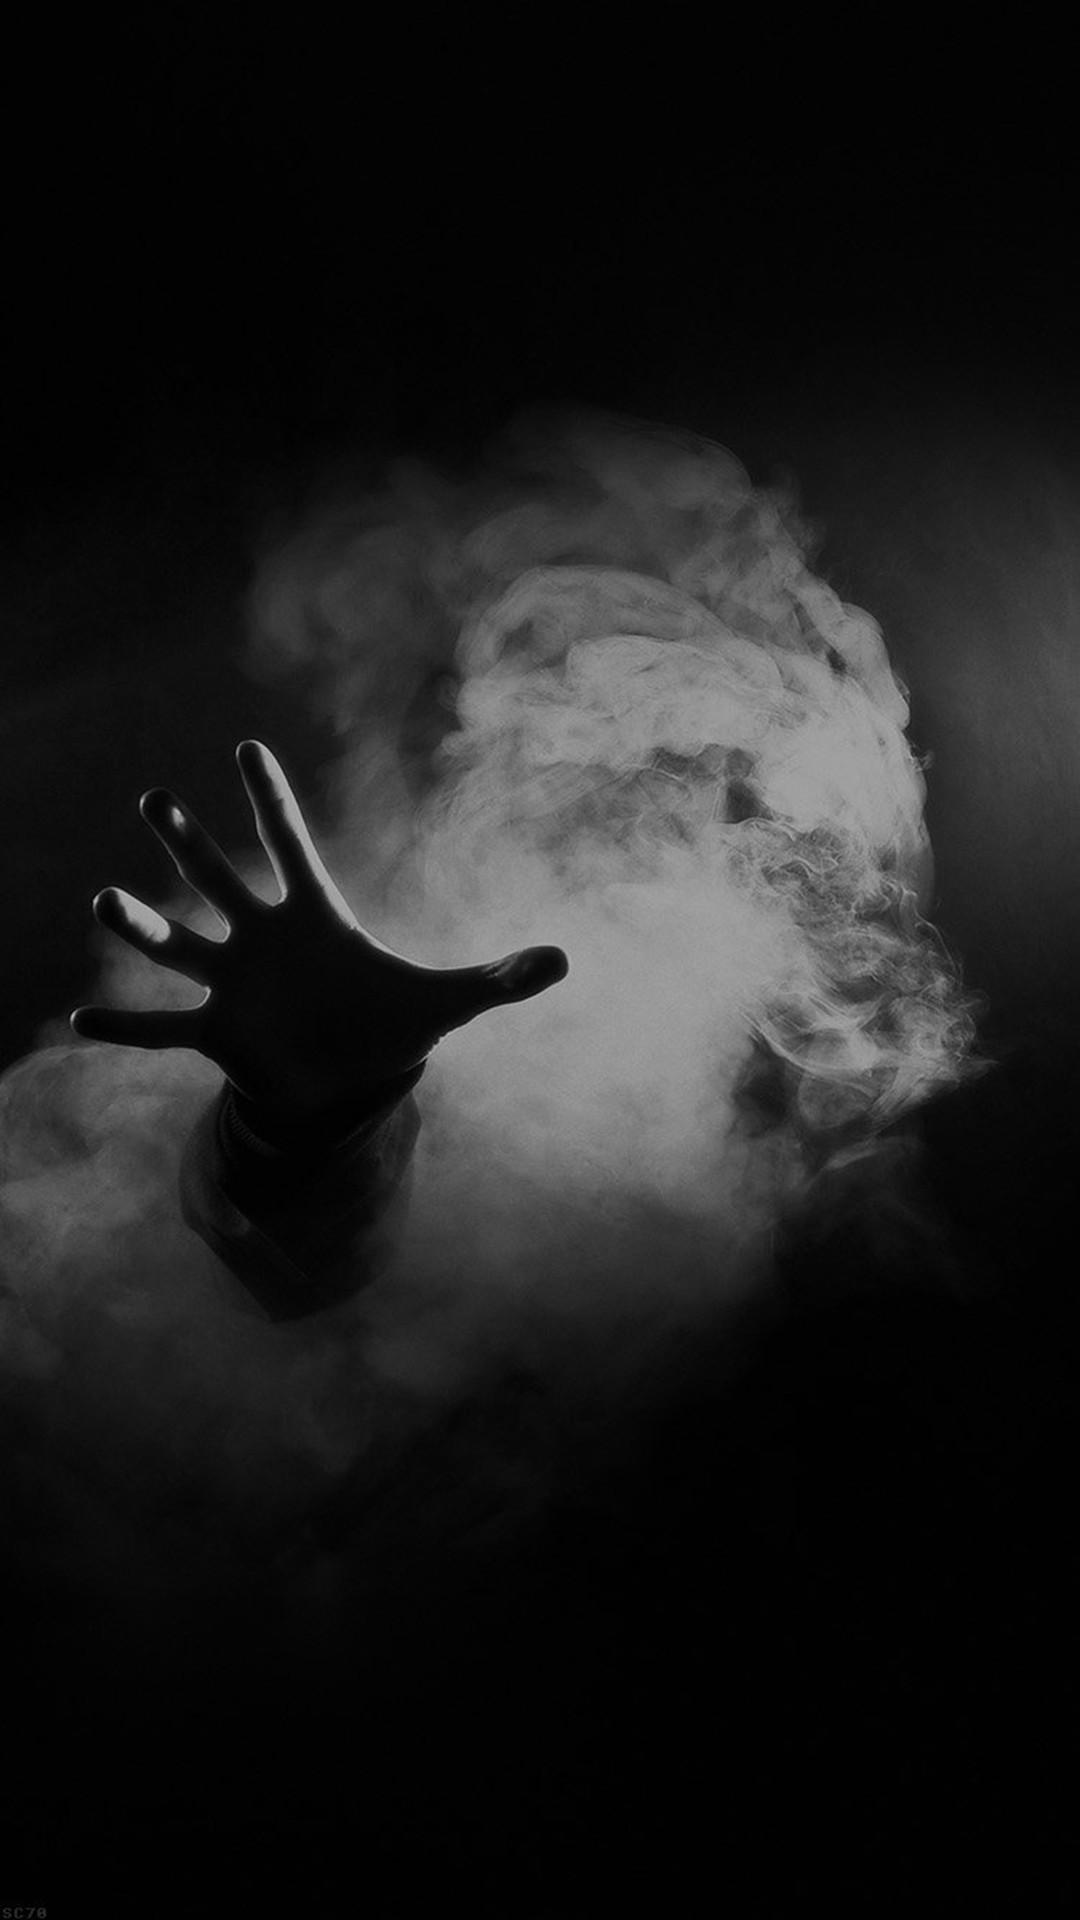 Hand From Smoke Black iPhone 8 wallpaper